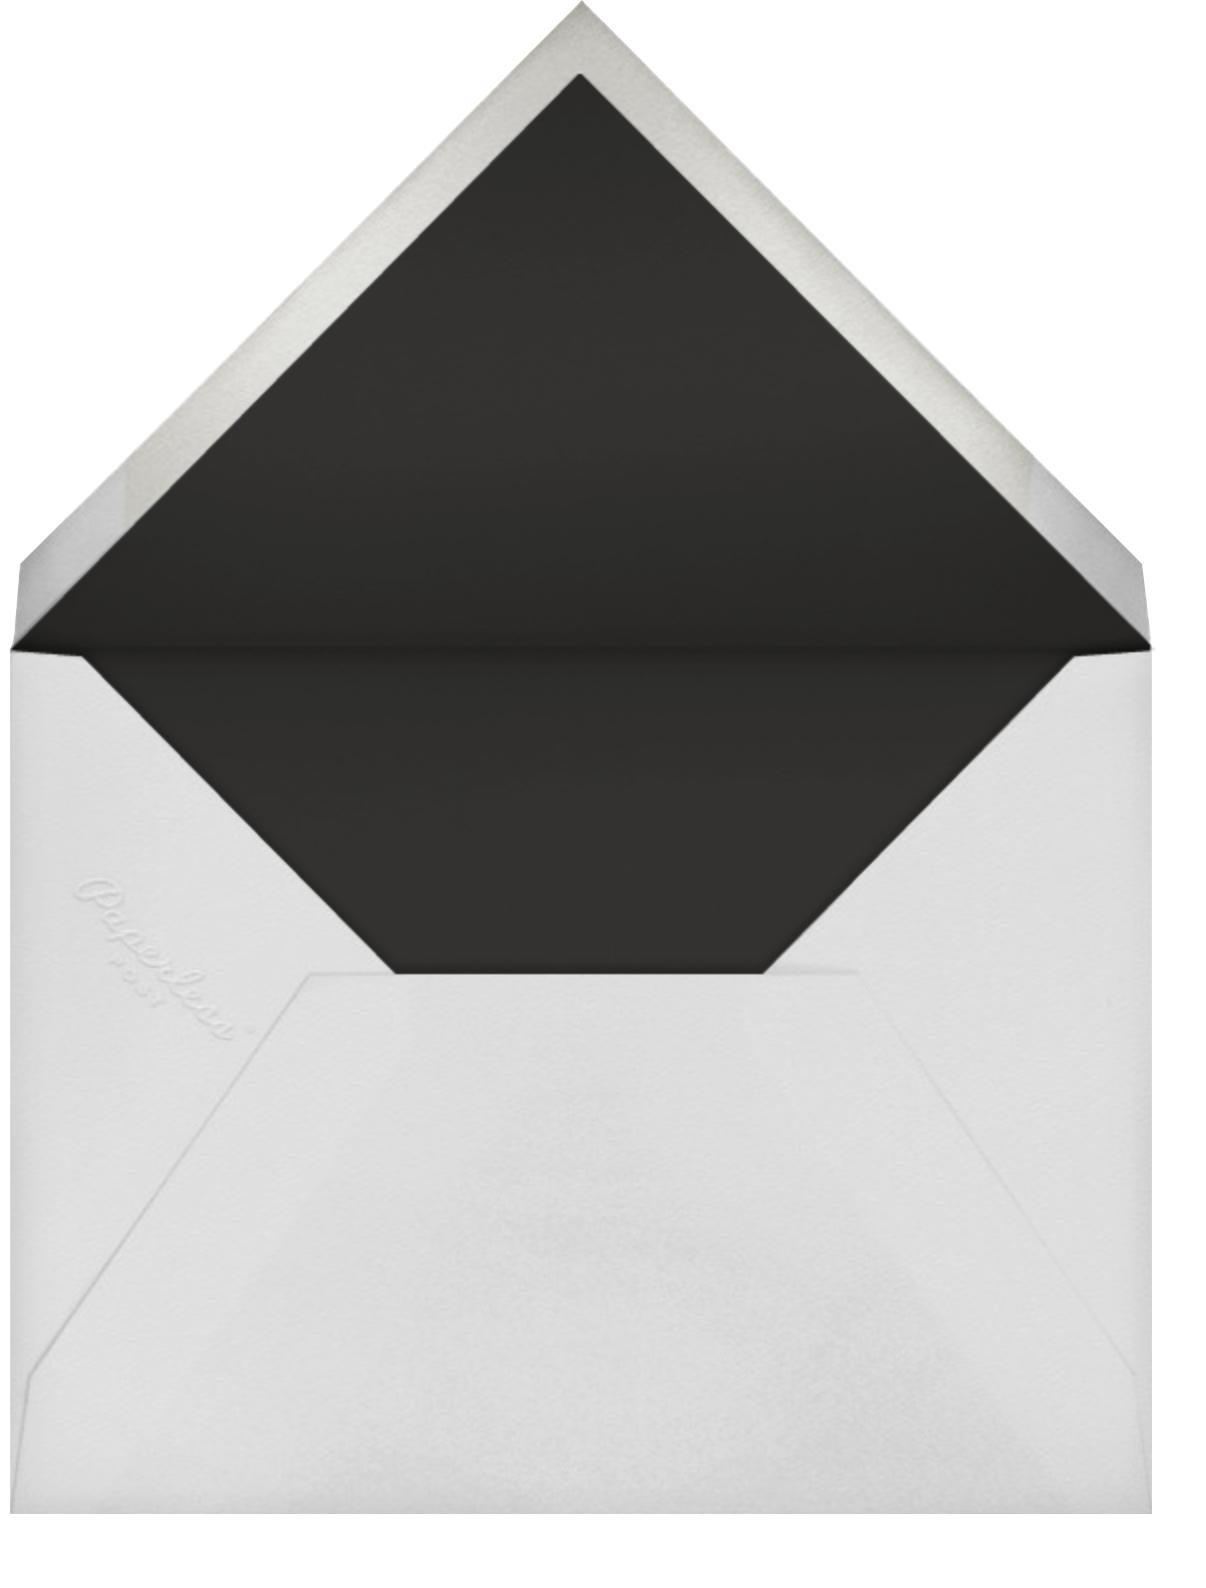 Ruffle - Pewter Gray - Vera Wang - Envelope